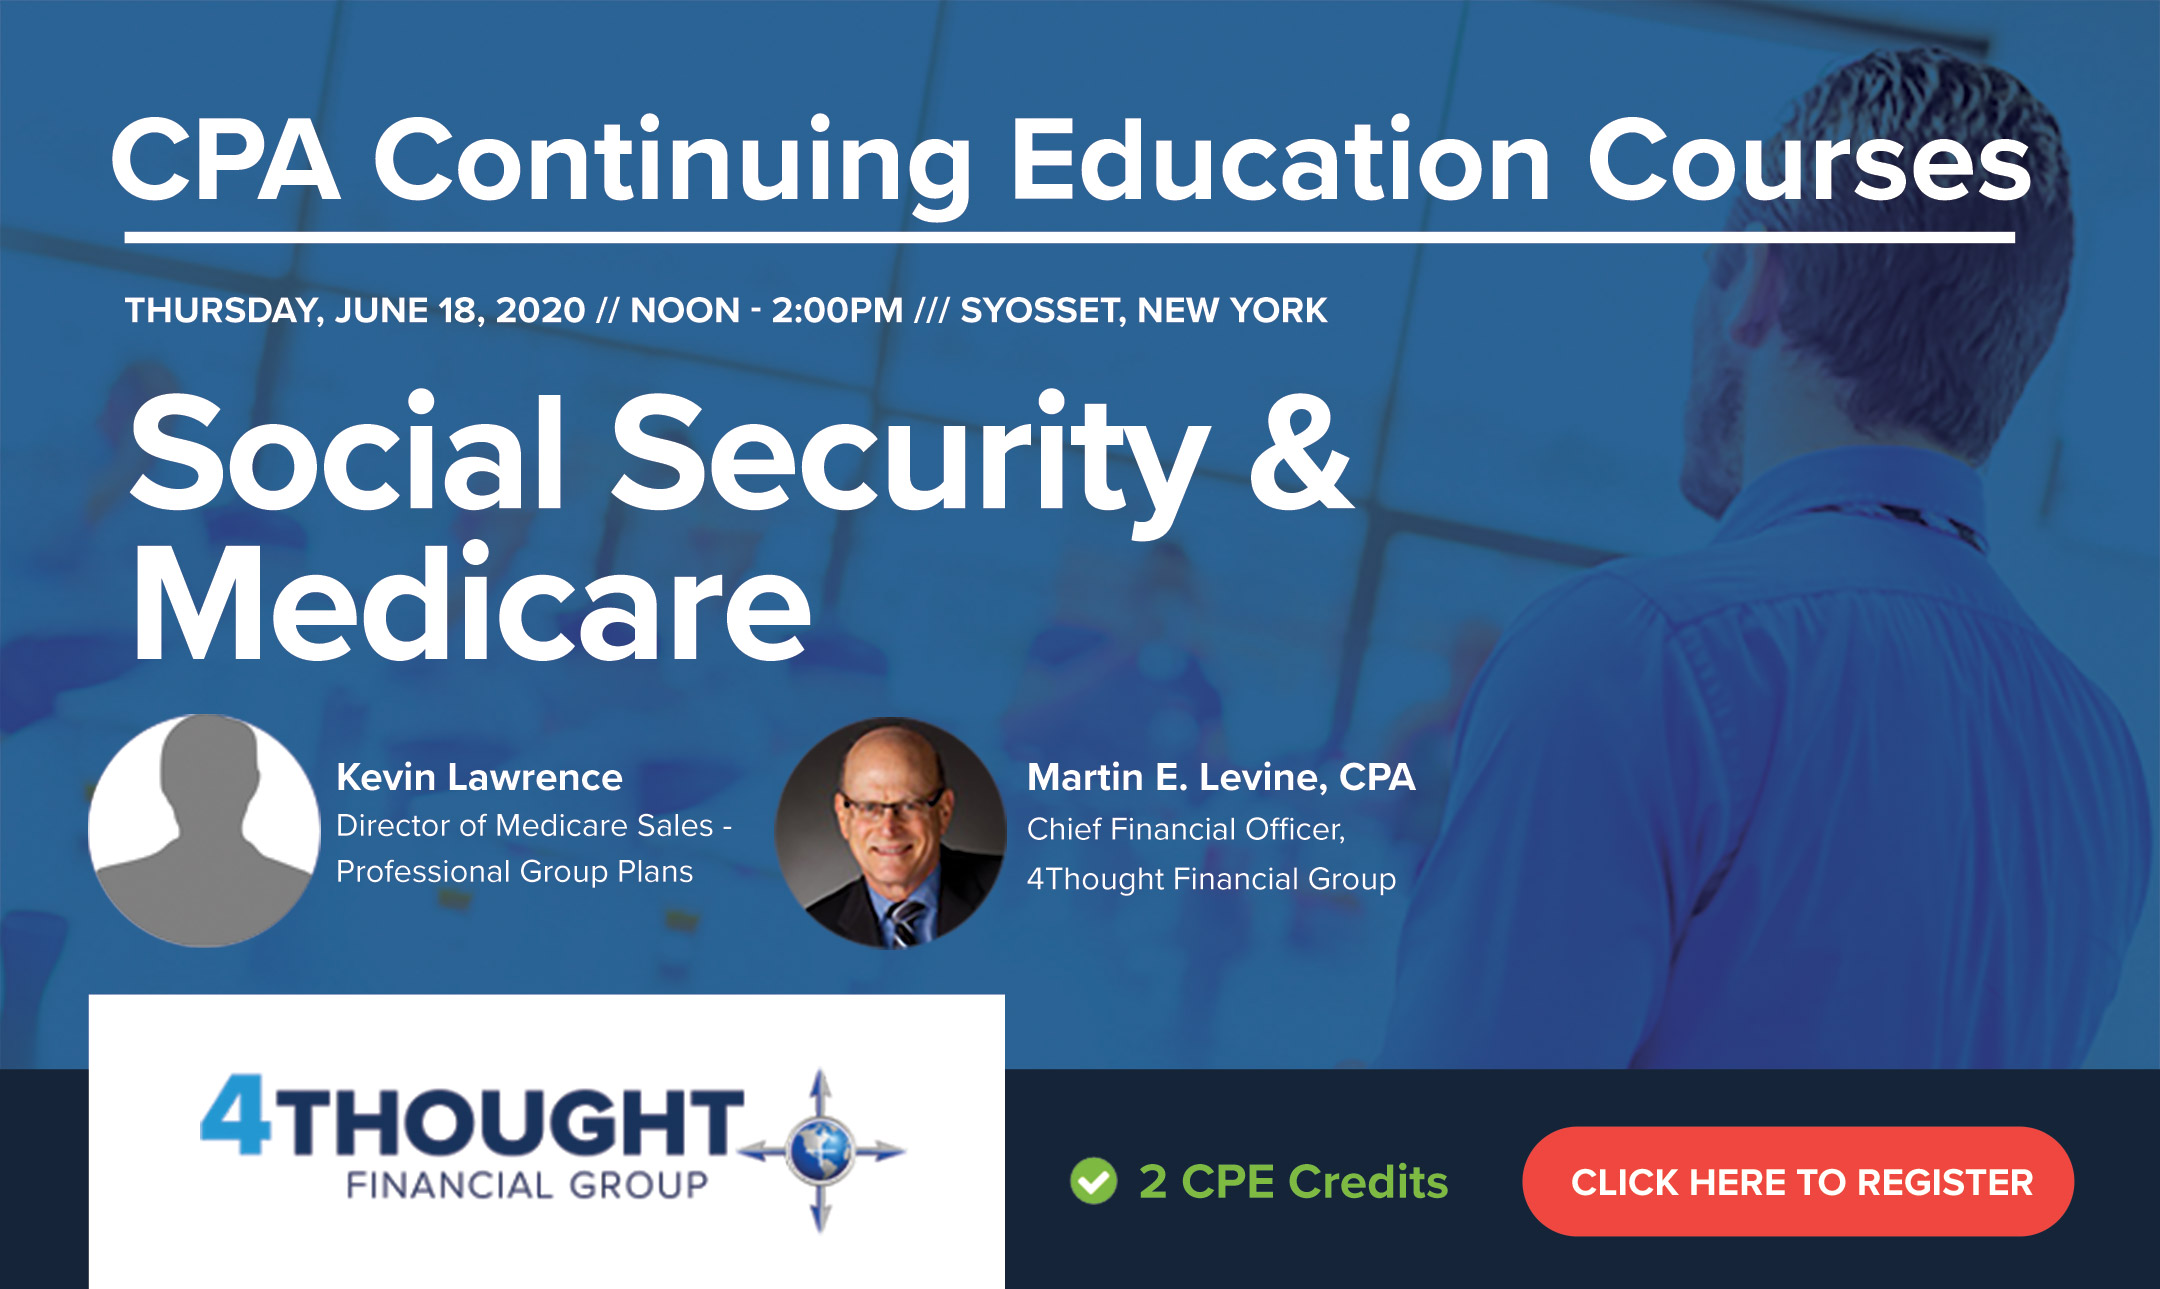 CPA Continuing Education Course:Social Security & Medicare